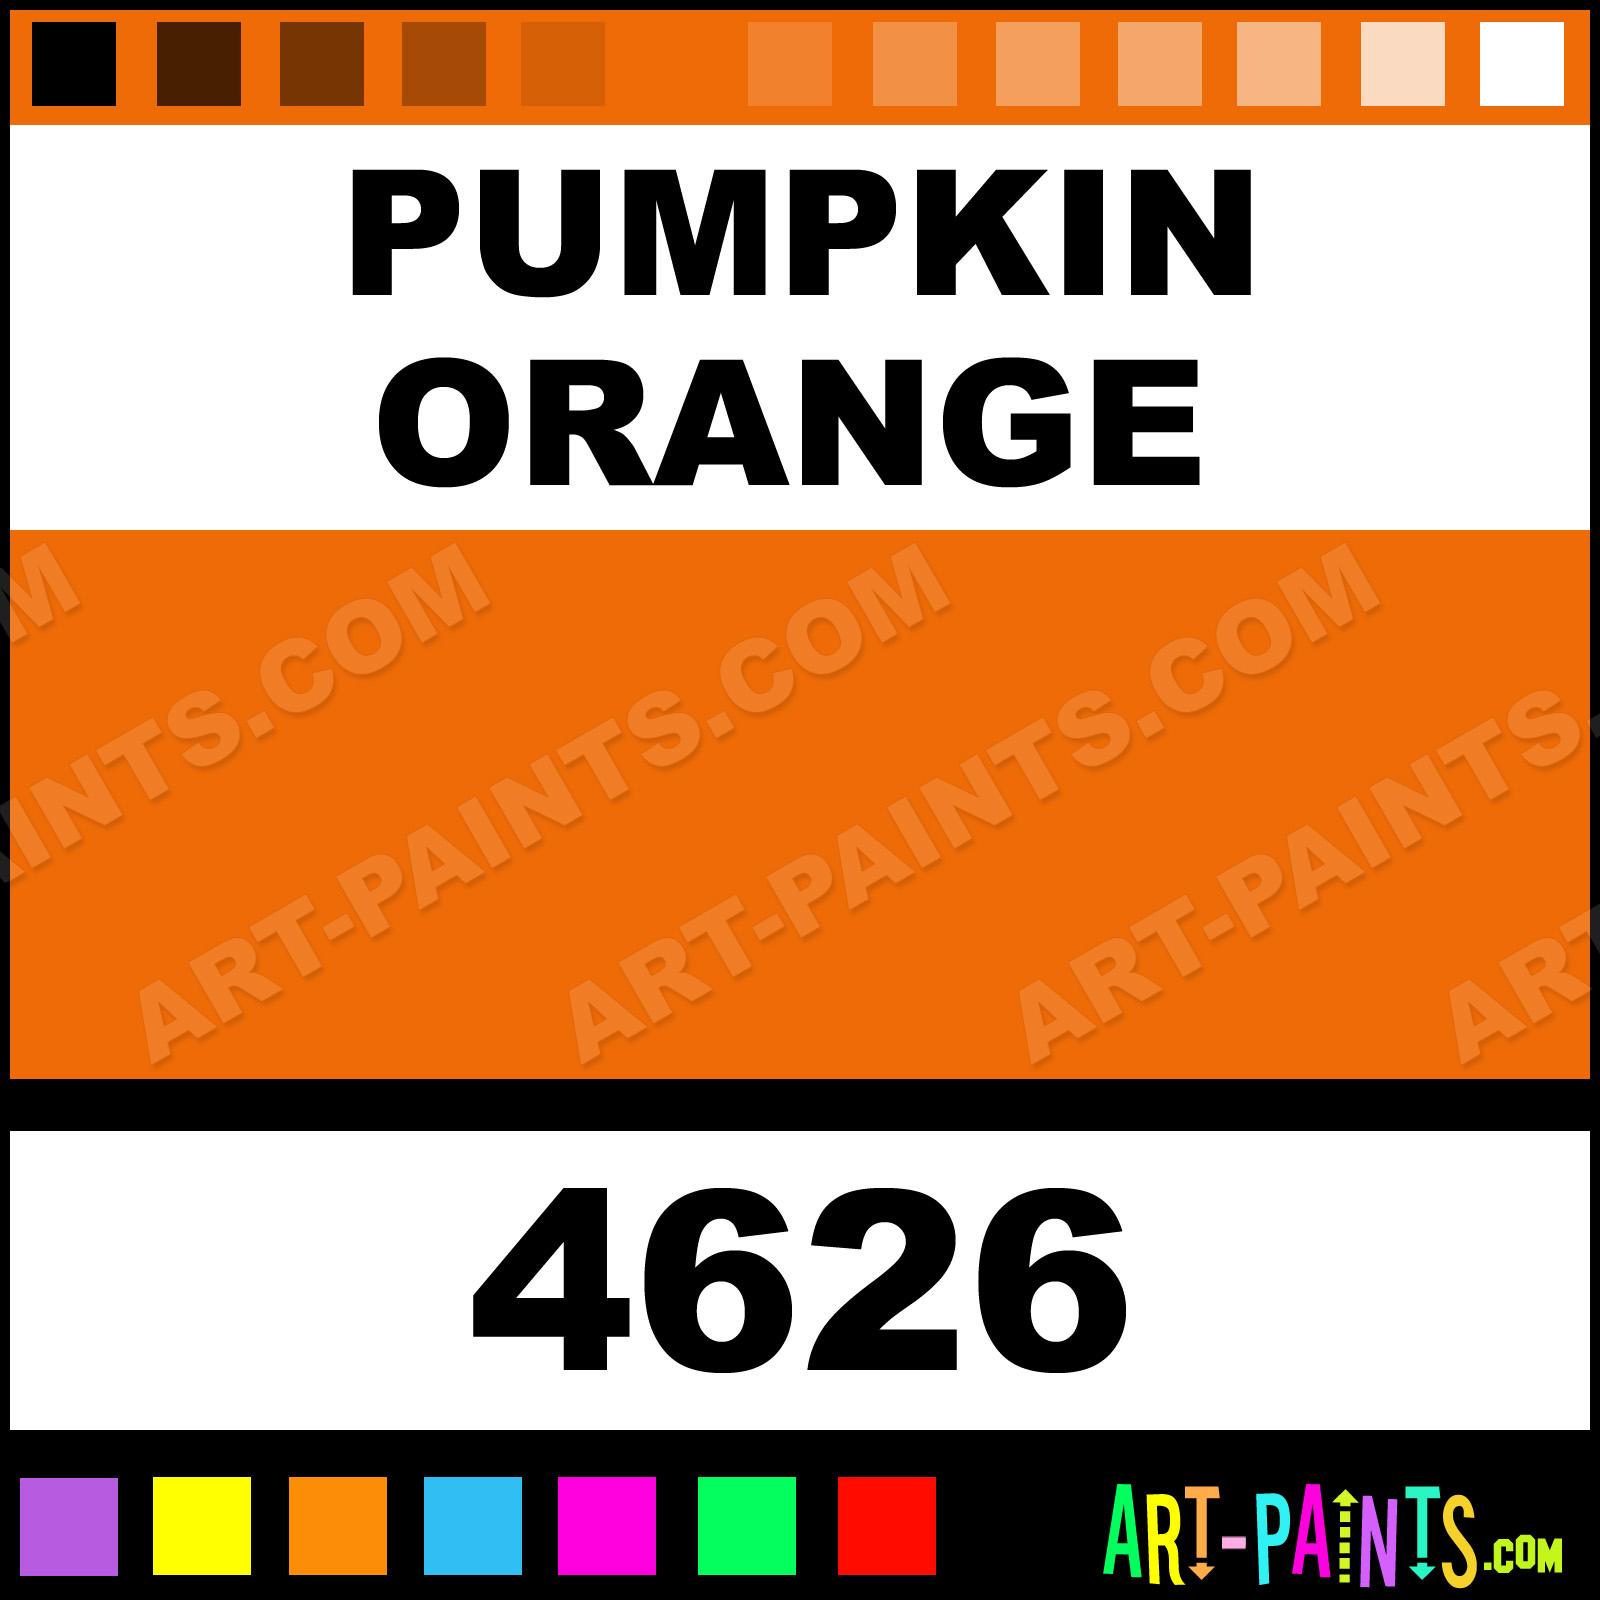 pumpkin orange spray enamel paints - 4626 - pumpkin orange paint